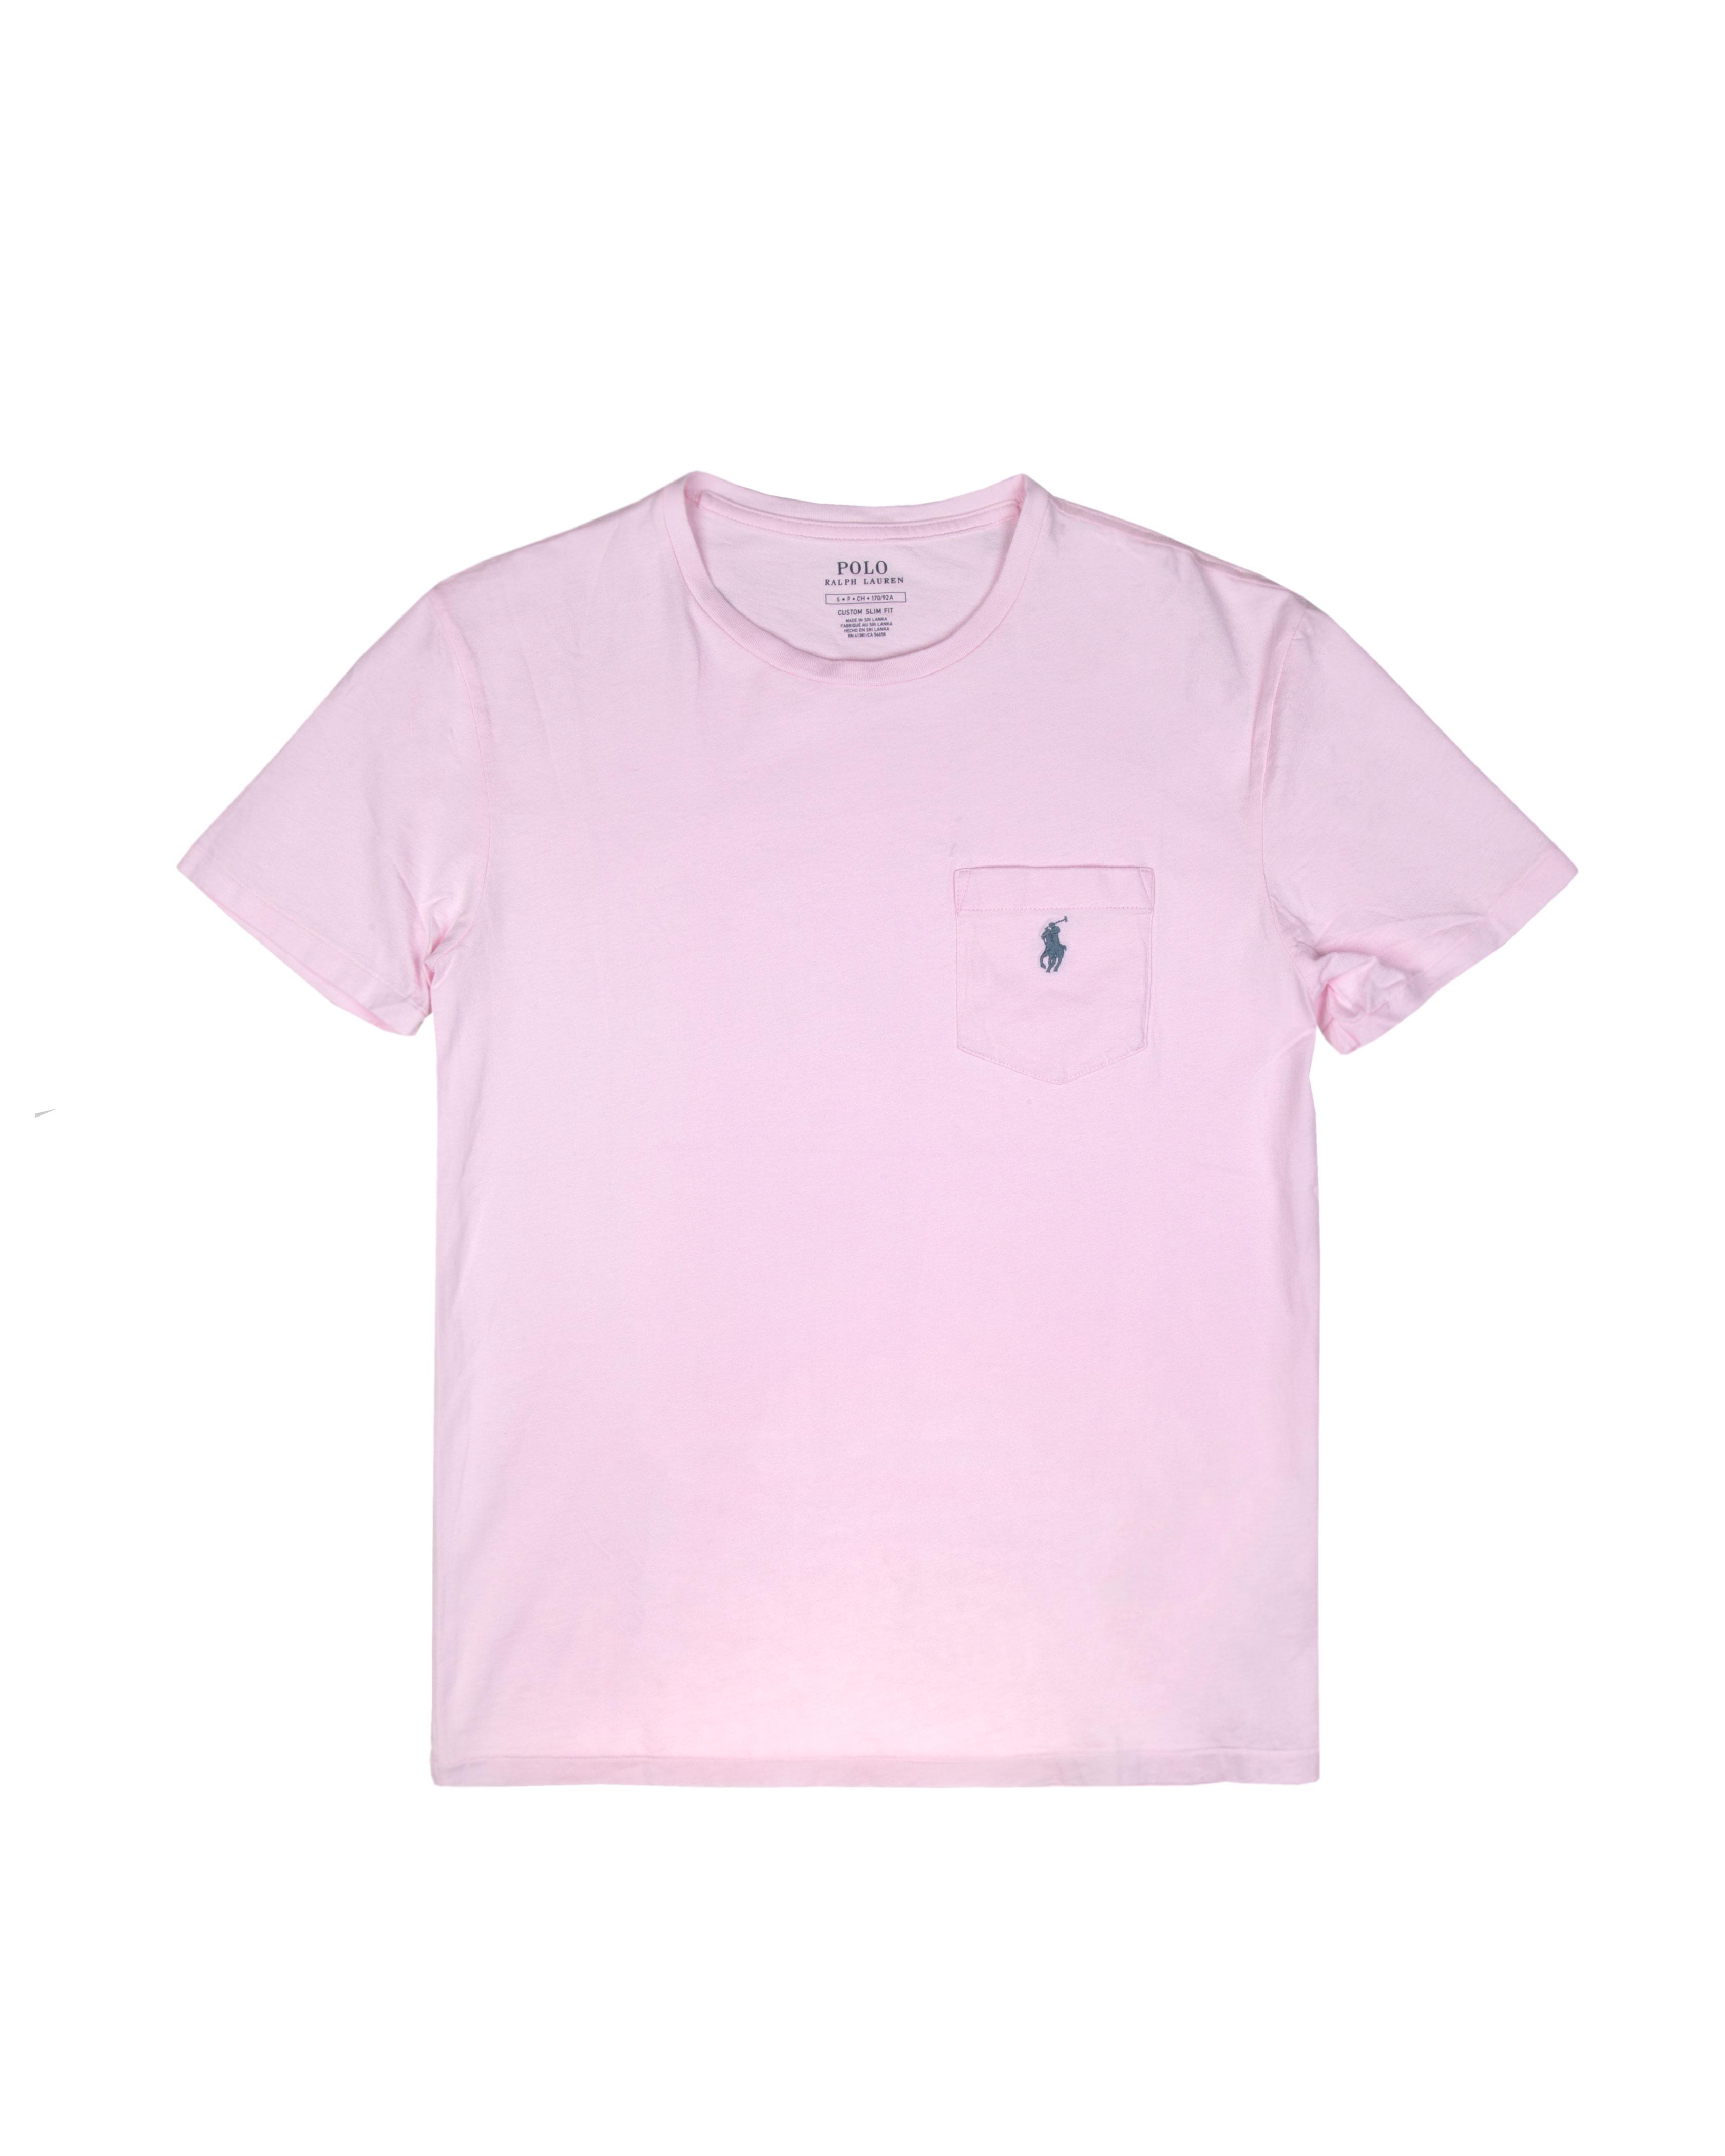 Футболка Ralph Lauren Pocket Carmel Pink Tee